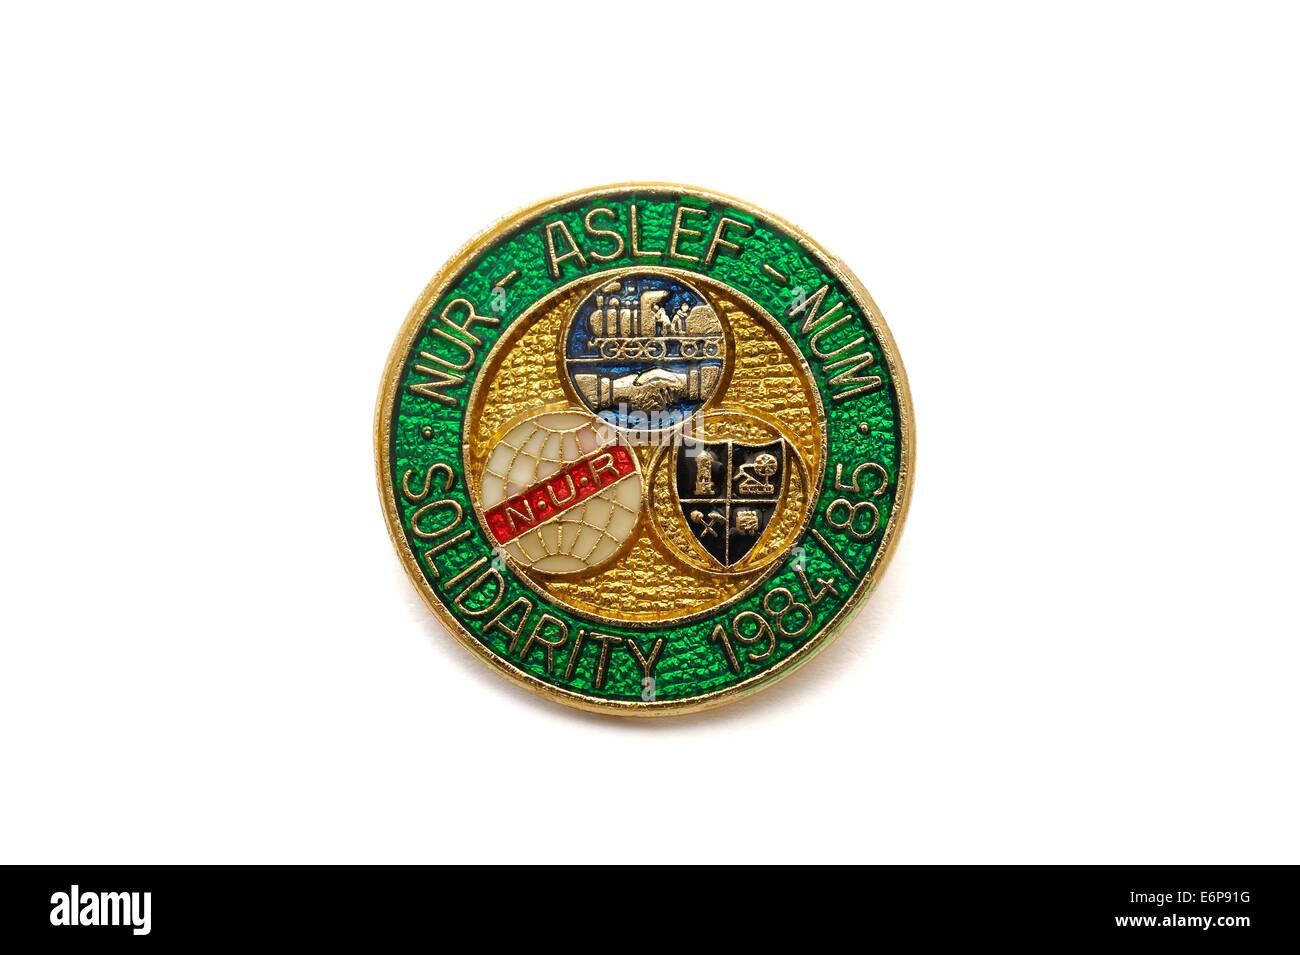 NUR,ASLEF,NUM. Solidarity enamel pin badge 1984-1985 - Stock Image